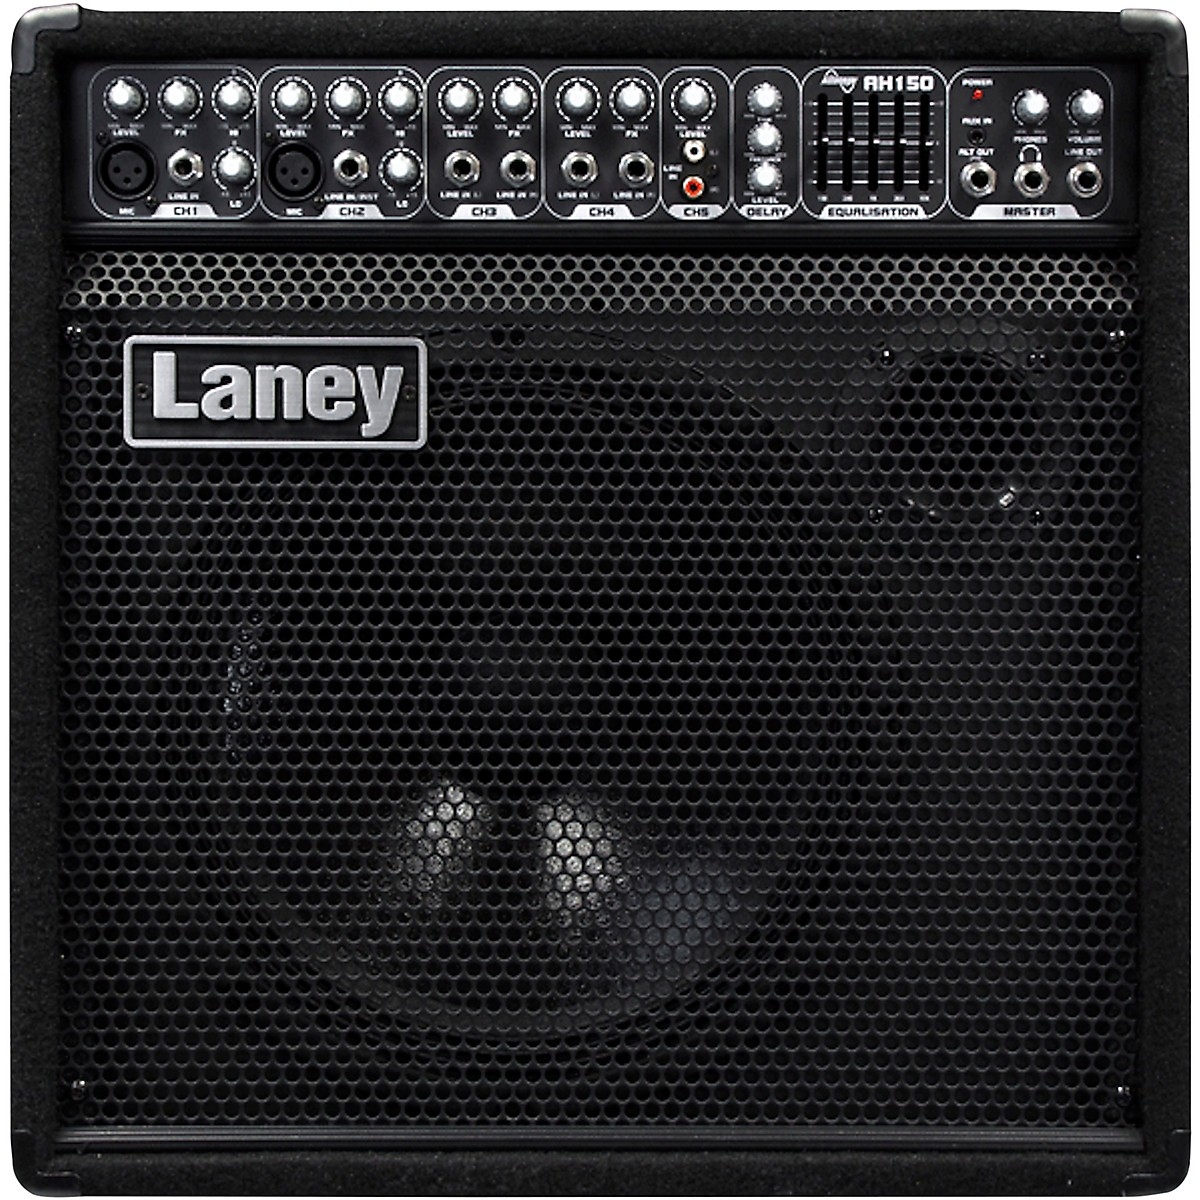 Laney Laney AH150 Audio Hub Combo Mulit-input 5 Channels. 5-Band Master EQ & Digital Delay. 150W